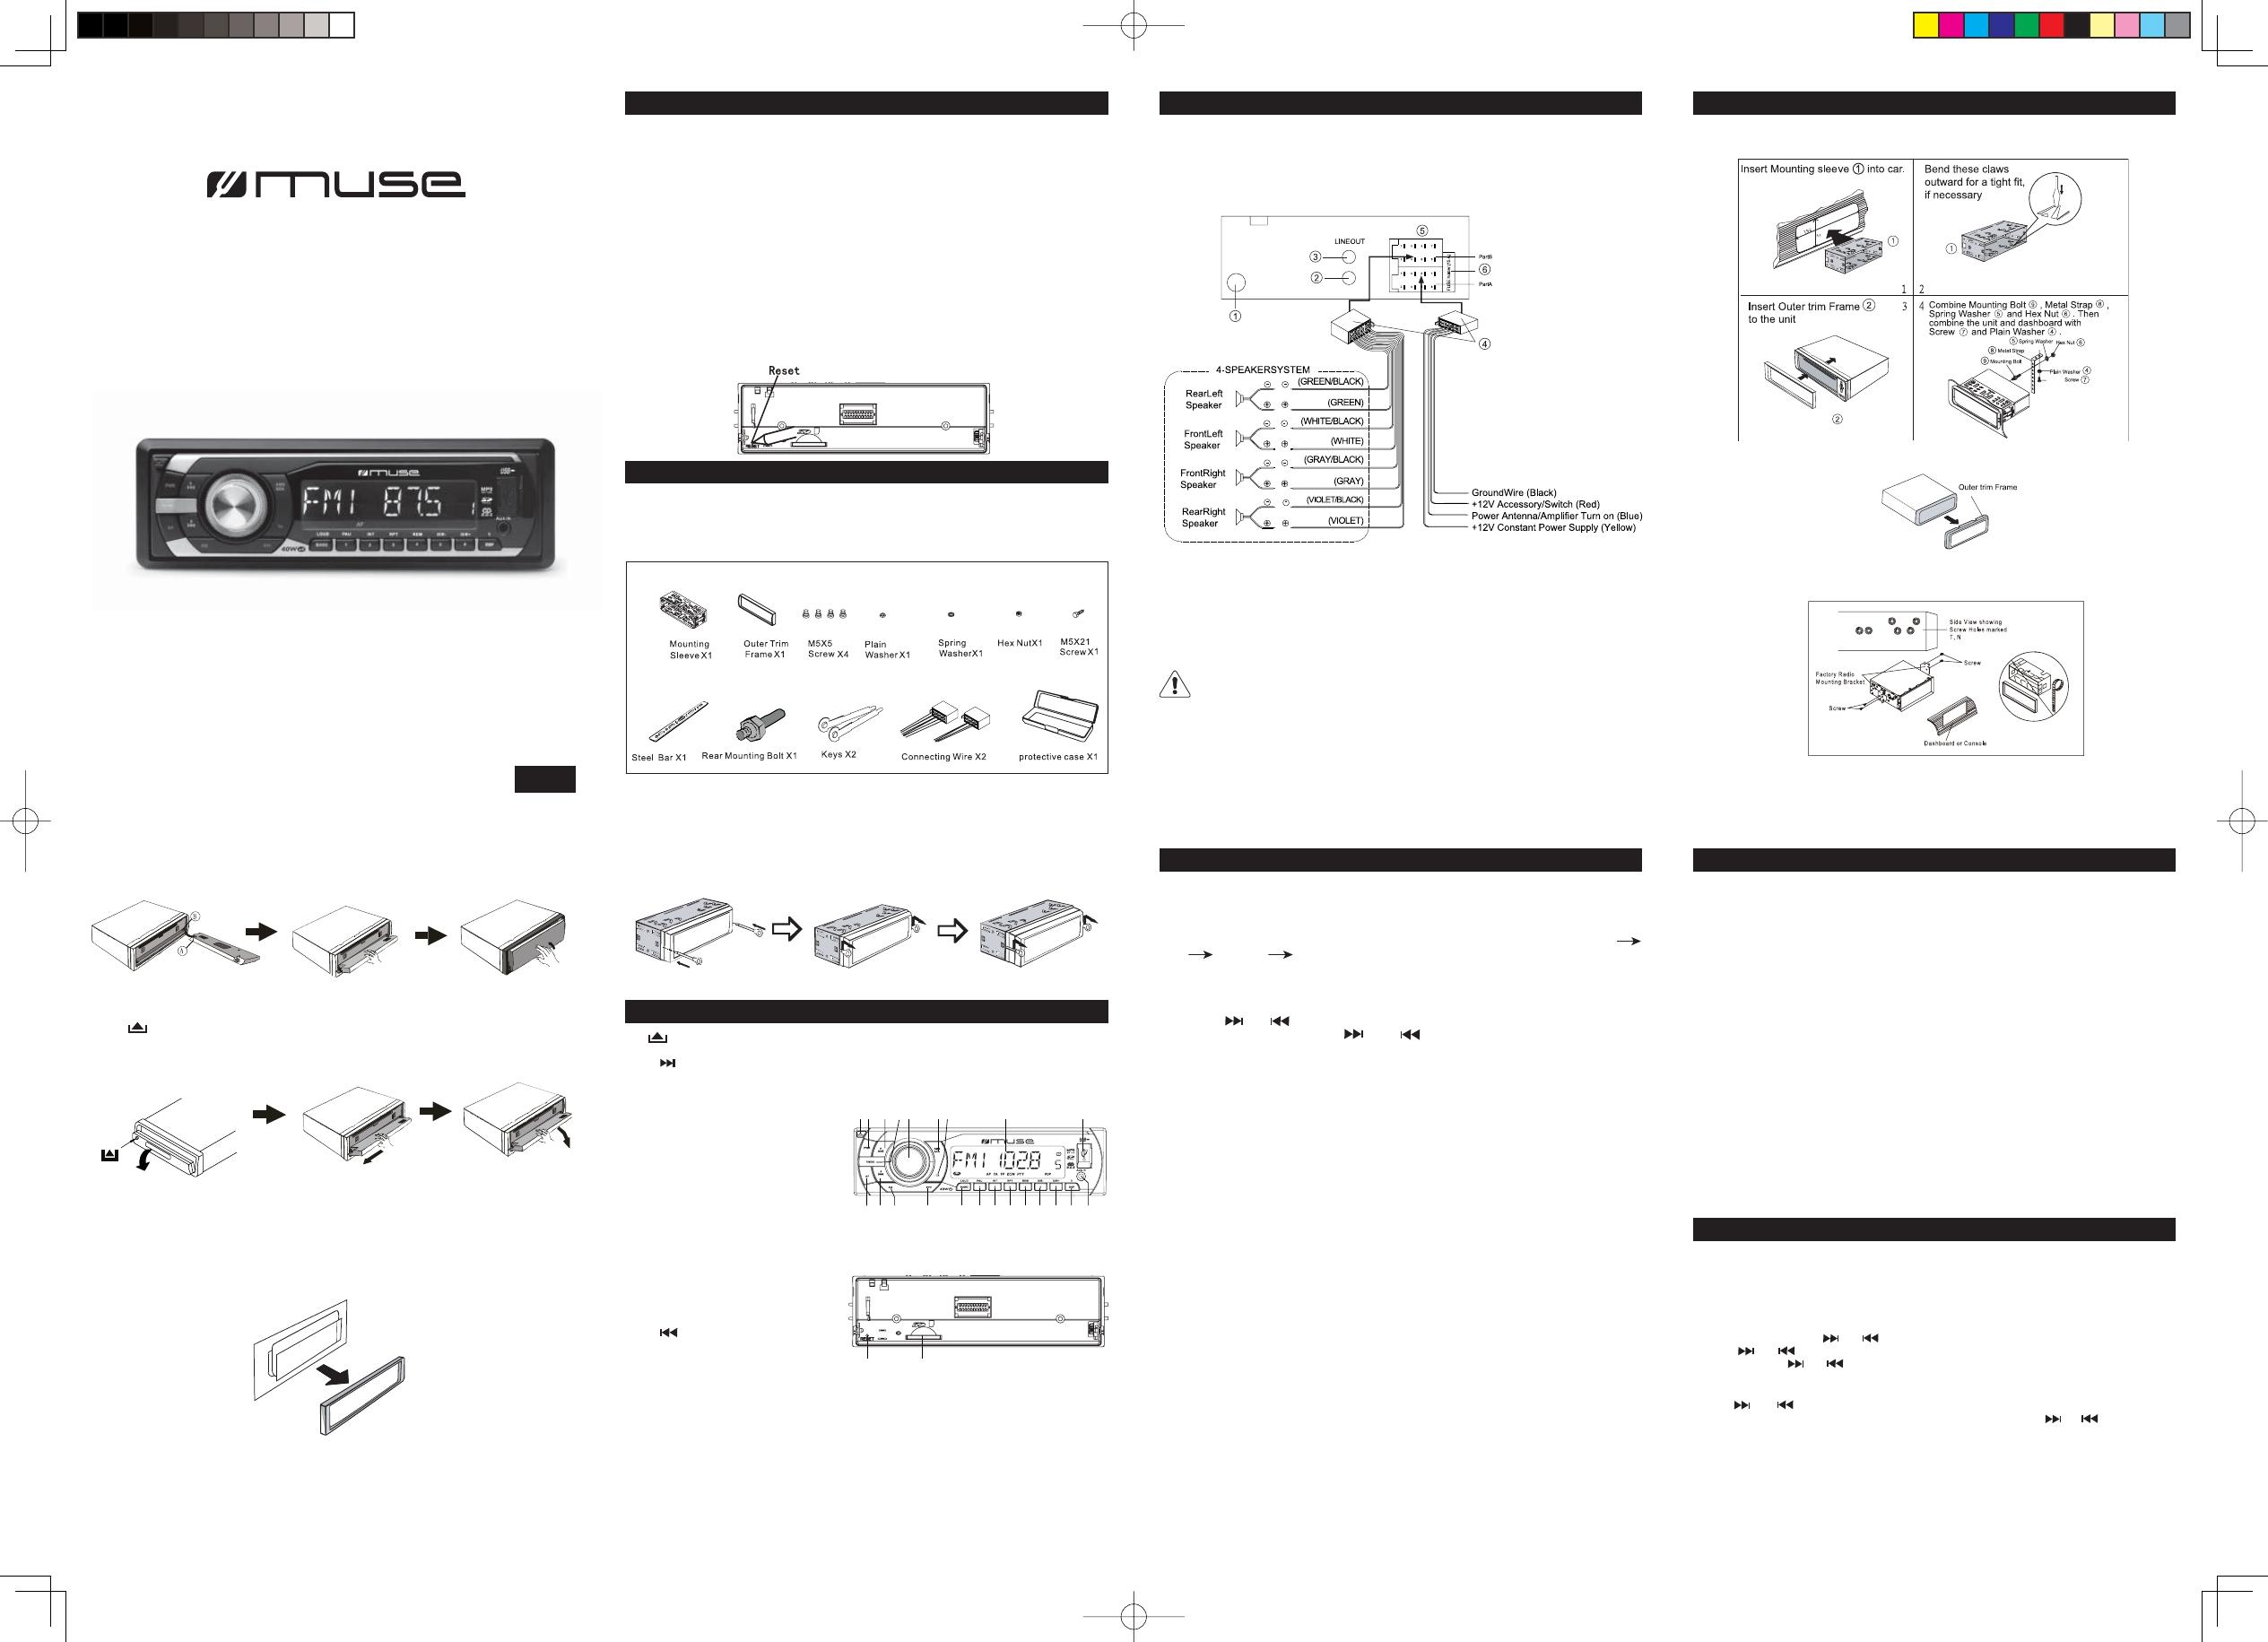 muse wiring diagram wiring diagram all Circuit Diagram muse wiring diagram wiring diagram mouse wiring diagram muse wiring diagram